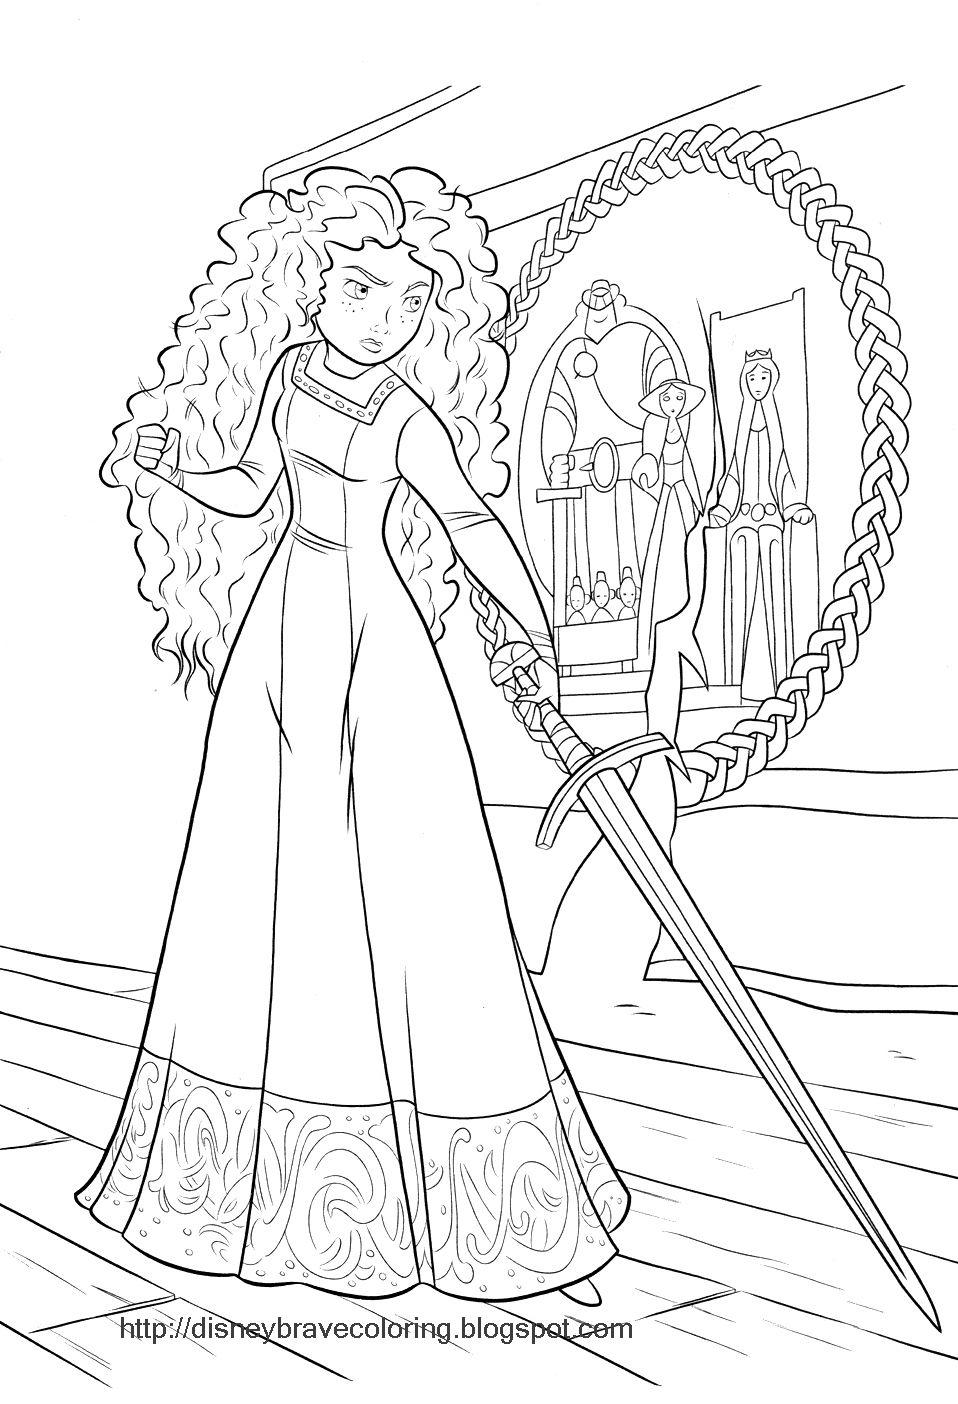 Brave Merida Coloring Pages Disney Princess Coloring Pages Princess Coloring Pages Disney Princess Colors